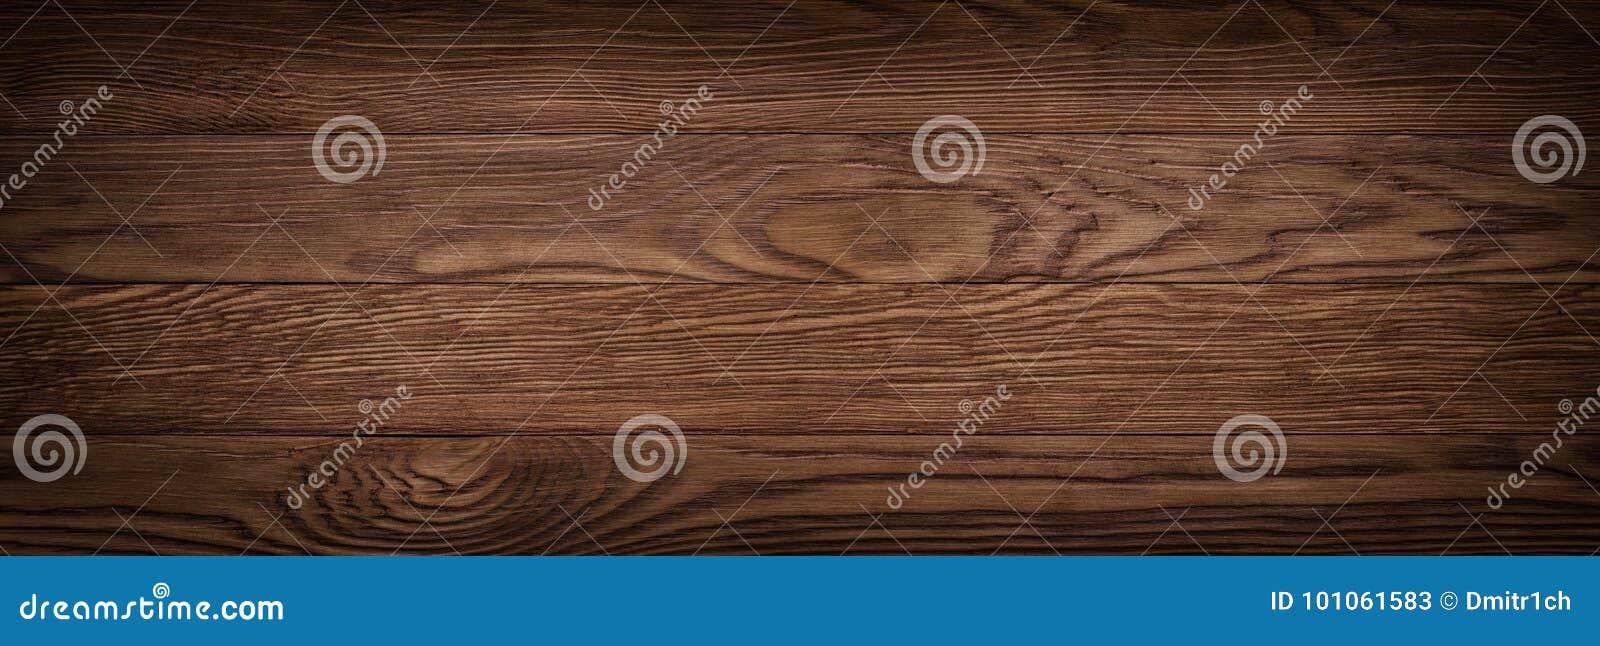 Vintage brown old rustics grunge wood texture, wooden surface ba